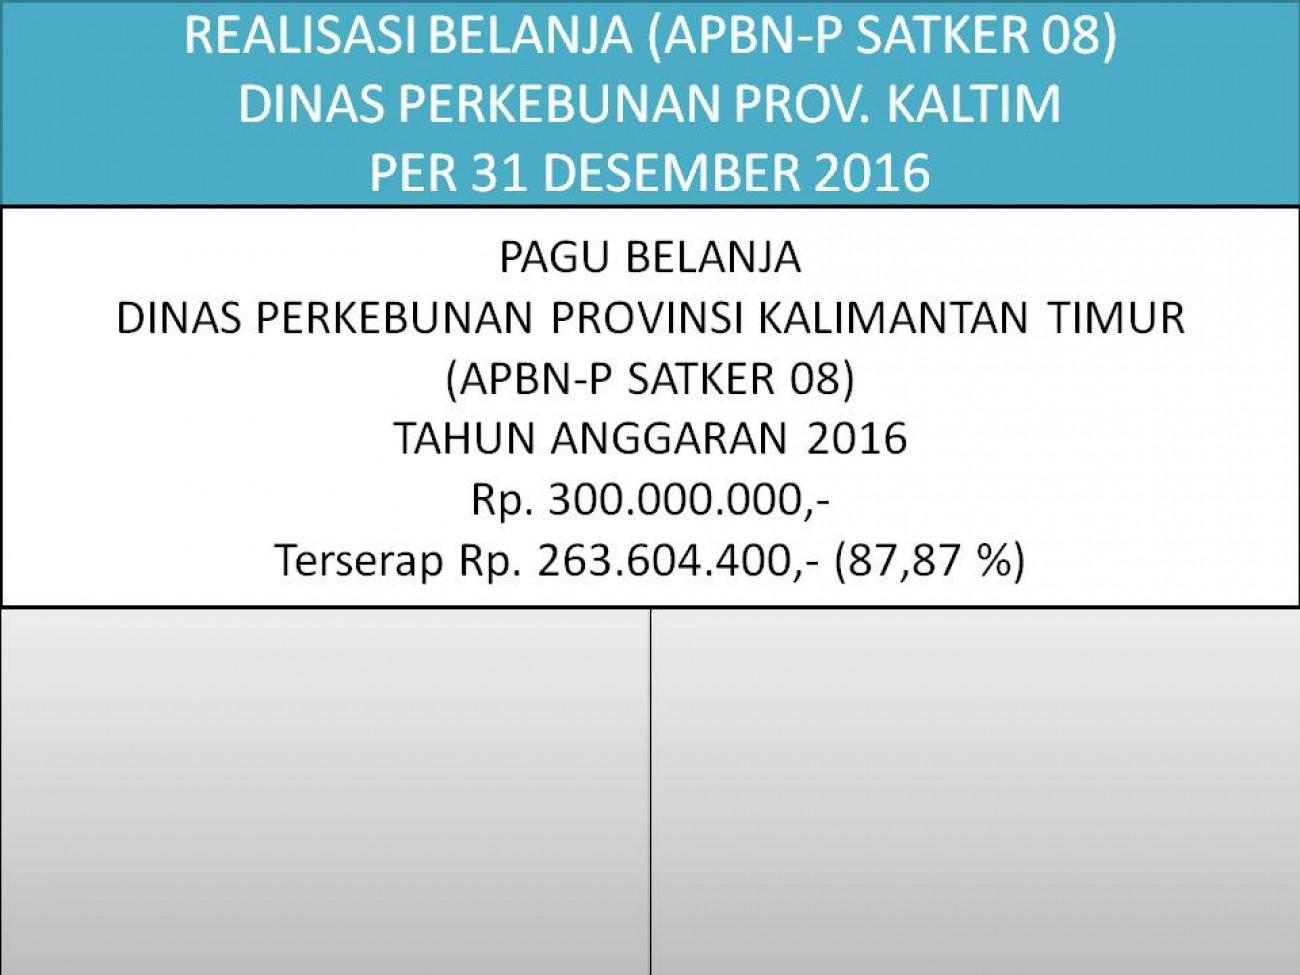 Laporan Realisasi APBN Satker 08 (Direktorat Jenderal Prasarana dan Sarana Pertanian) Dinas Perkebunan Prov. Kaltim Per 31 Desember 2016